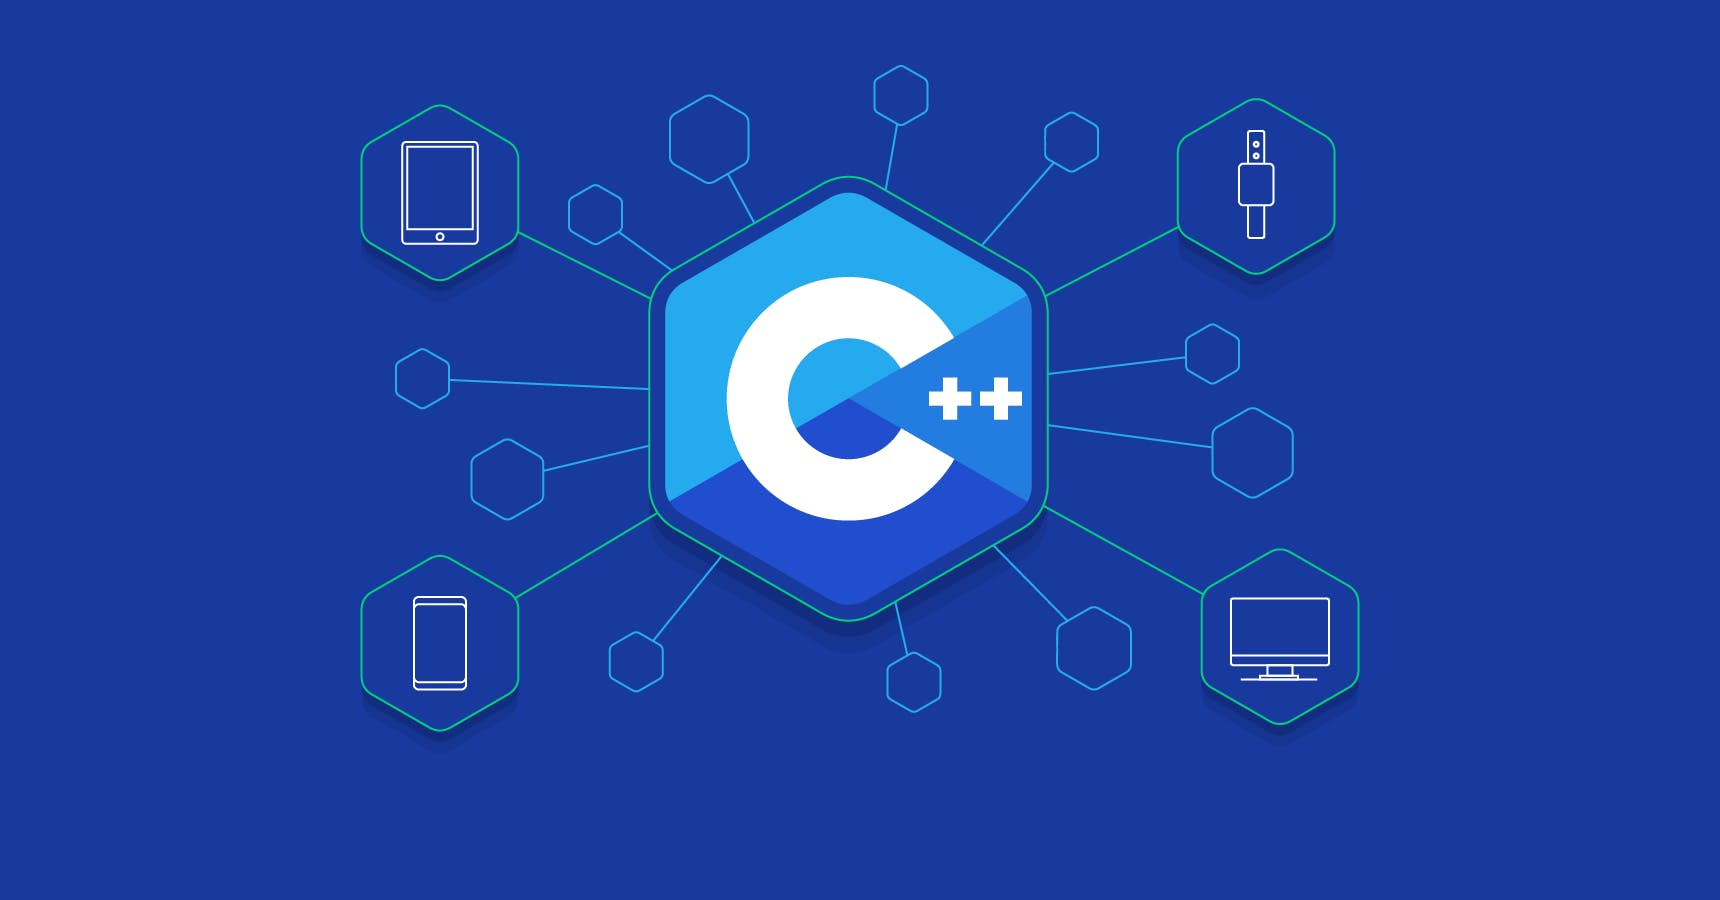 C coding language